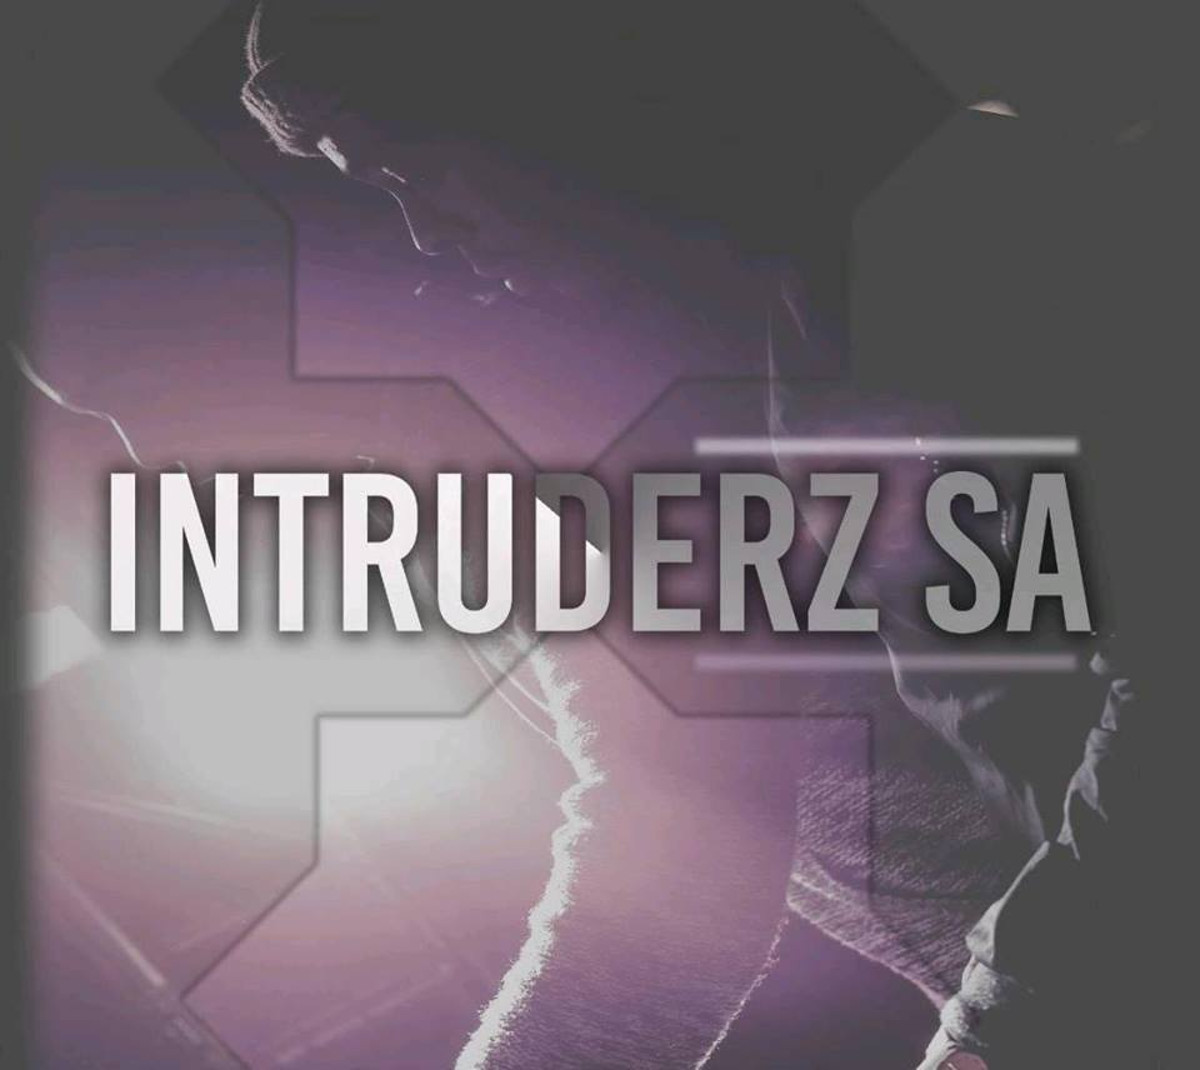 Intruderz SA - Intruderz SA & Muvo De Icon Ft. Tee-R – Kophelimali